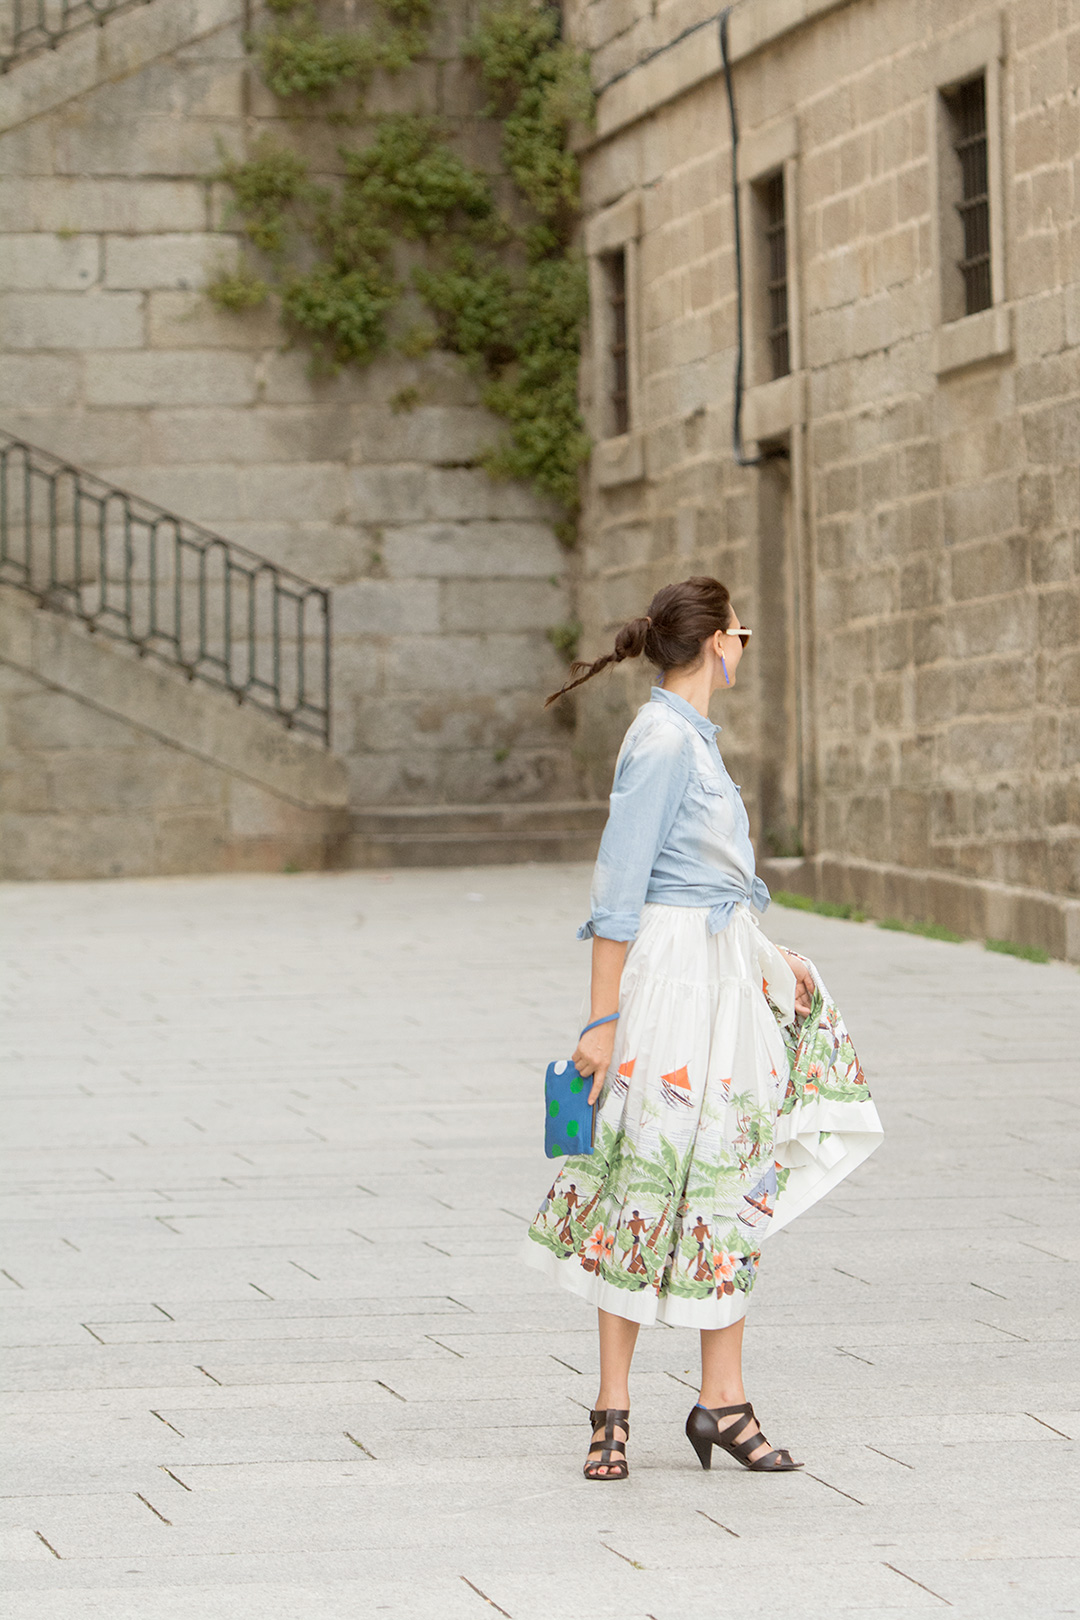 amalfi-leonor-gabala-street-style-mitmeblog-1080-02